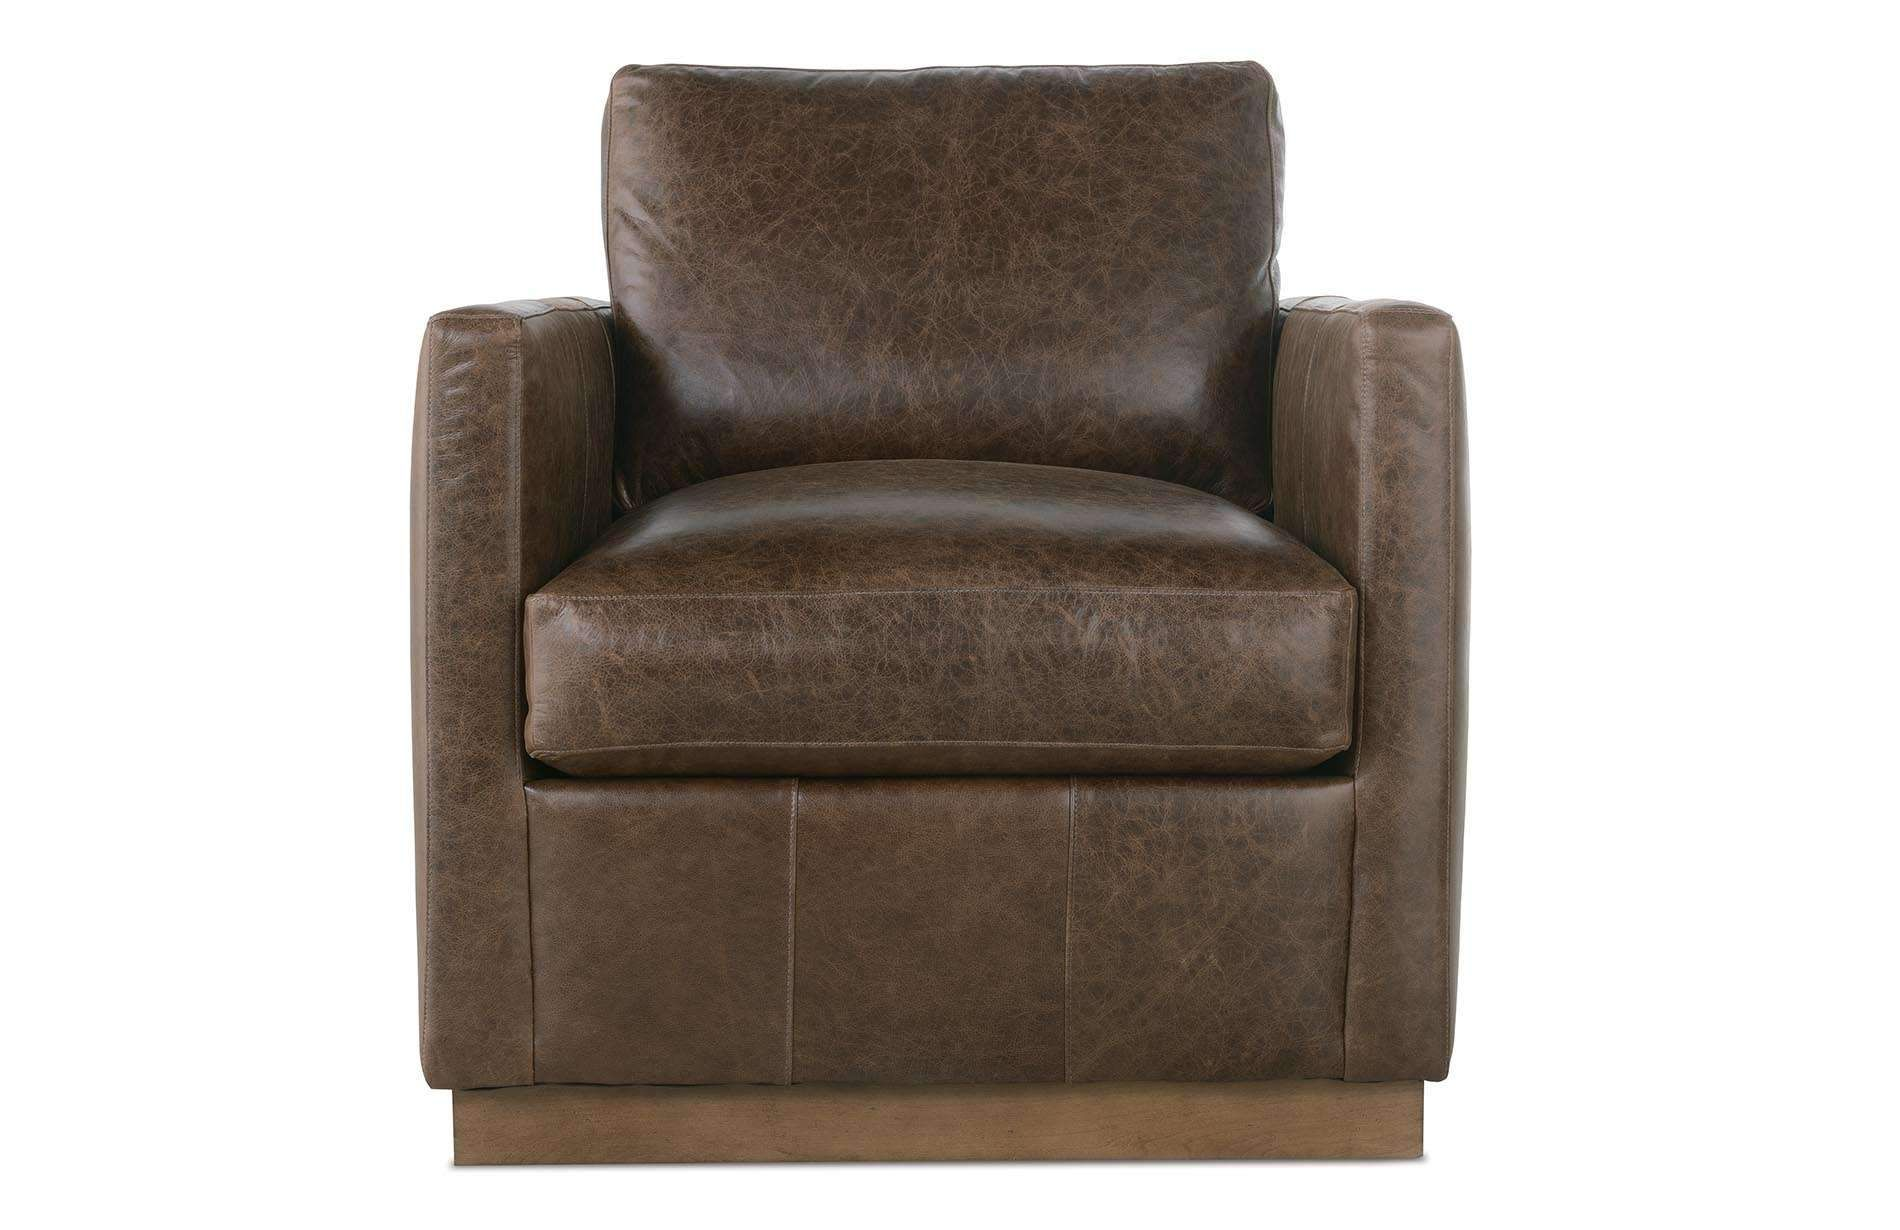 Ashton Swivel Chair Leather swivel chair, Swivel chair